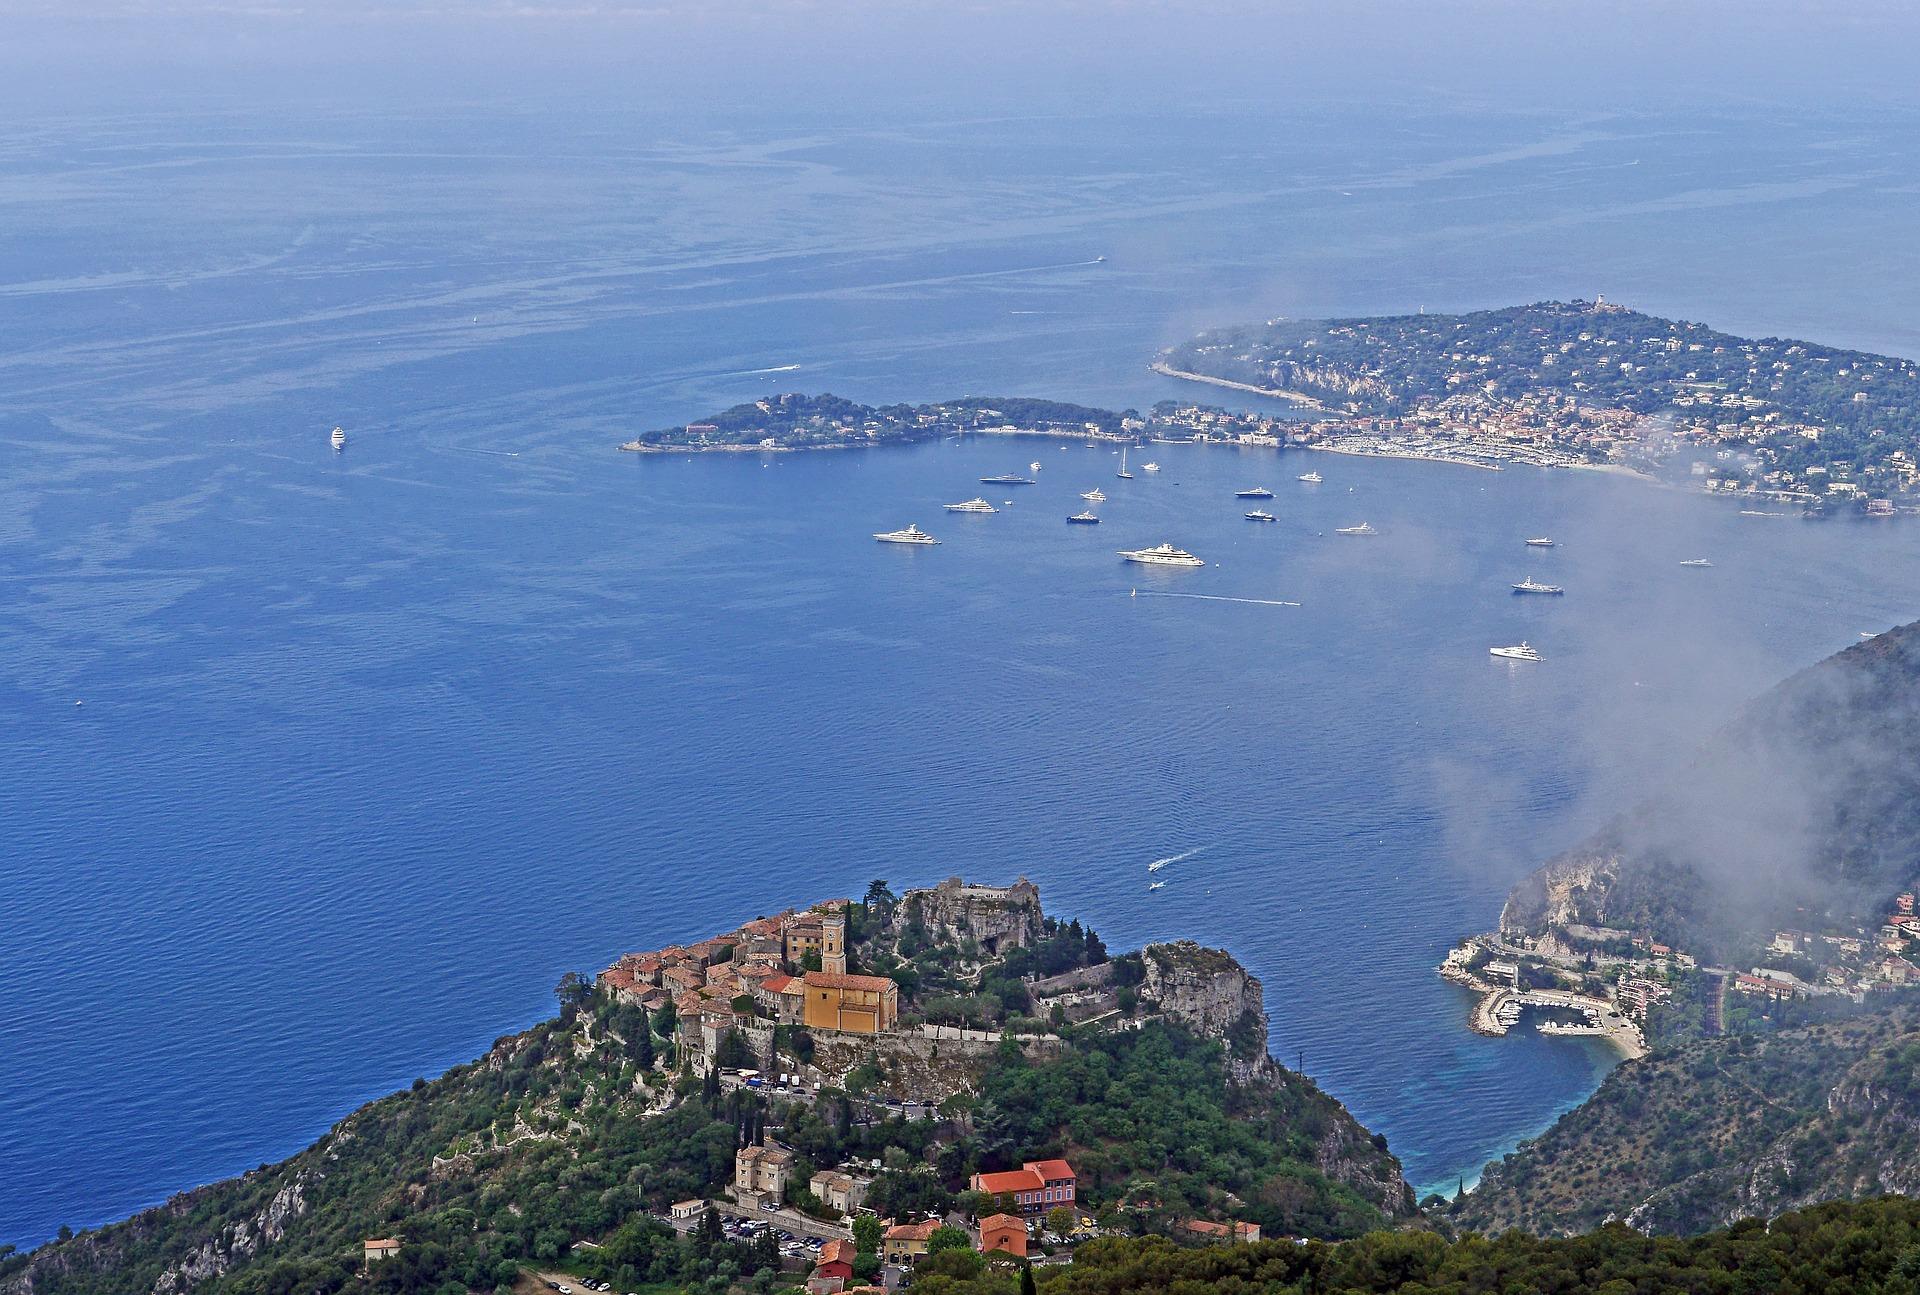 Eze village - wandelingen aan de Côte d'Azur